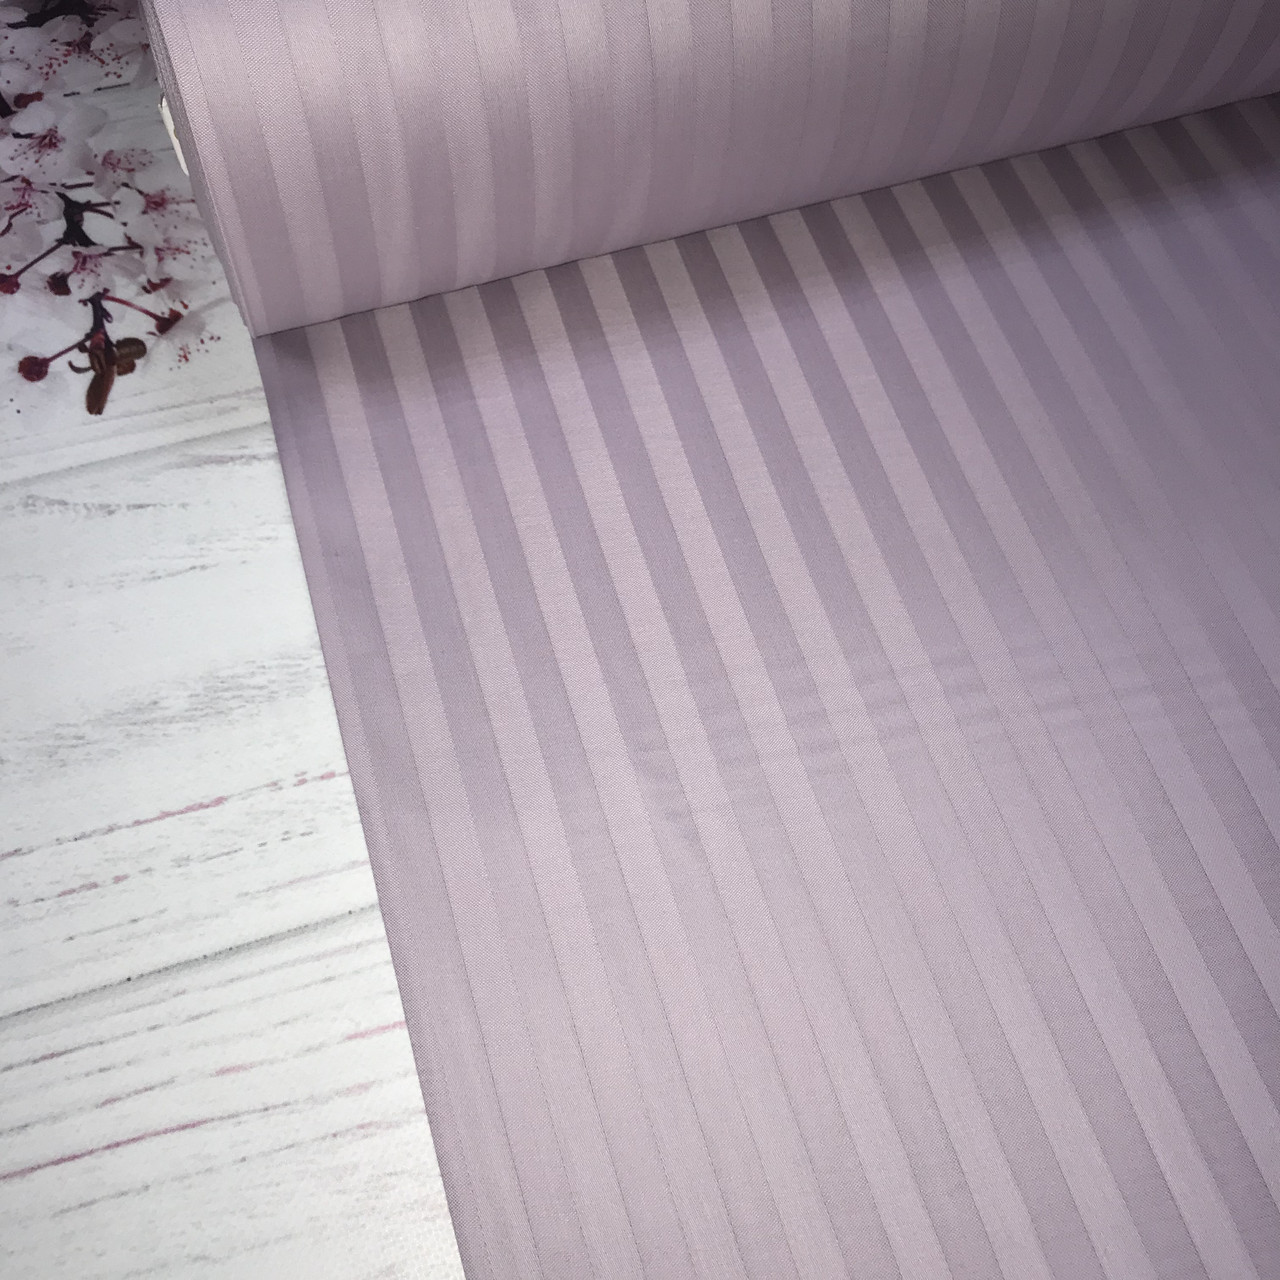 Сатин 100% хлопок  (ТУРЦИЯ шир. 2,4 м) Stripes сиреневый ОТРЕЗ(Размер 1,10*2,4м)